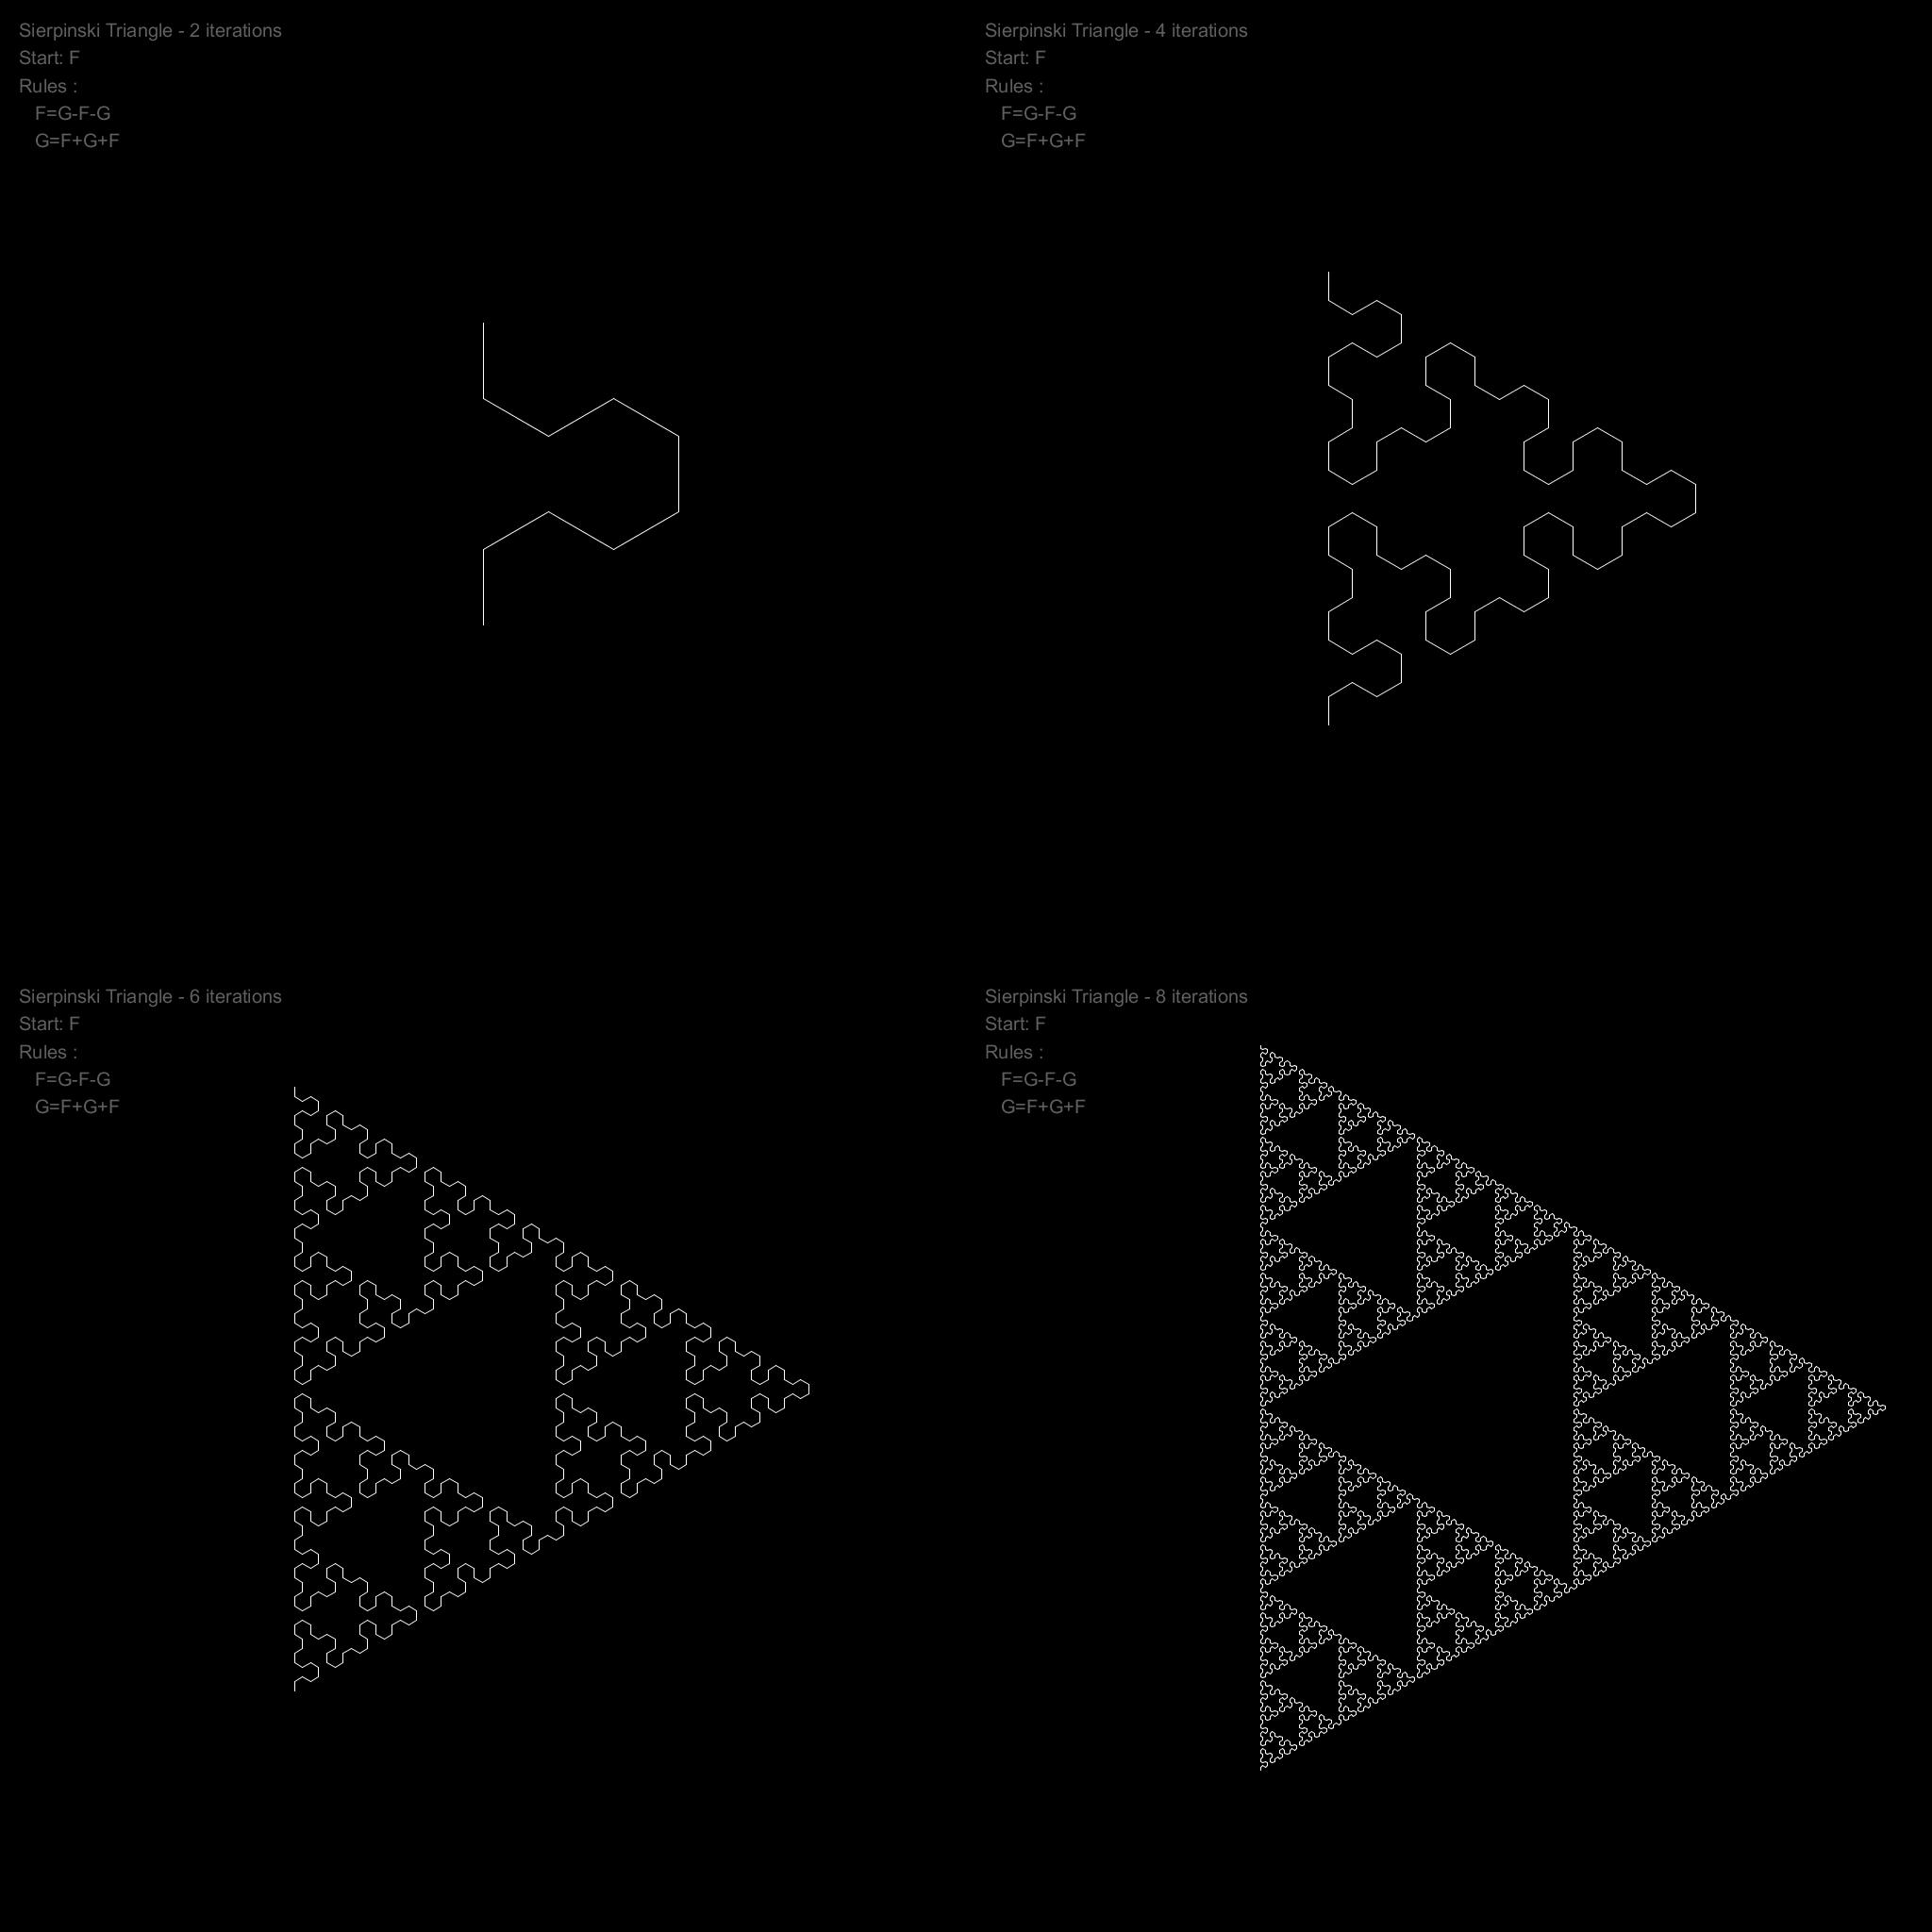 Sierpinski Triangle Examples